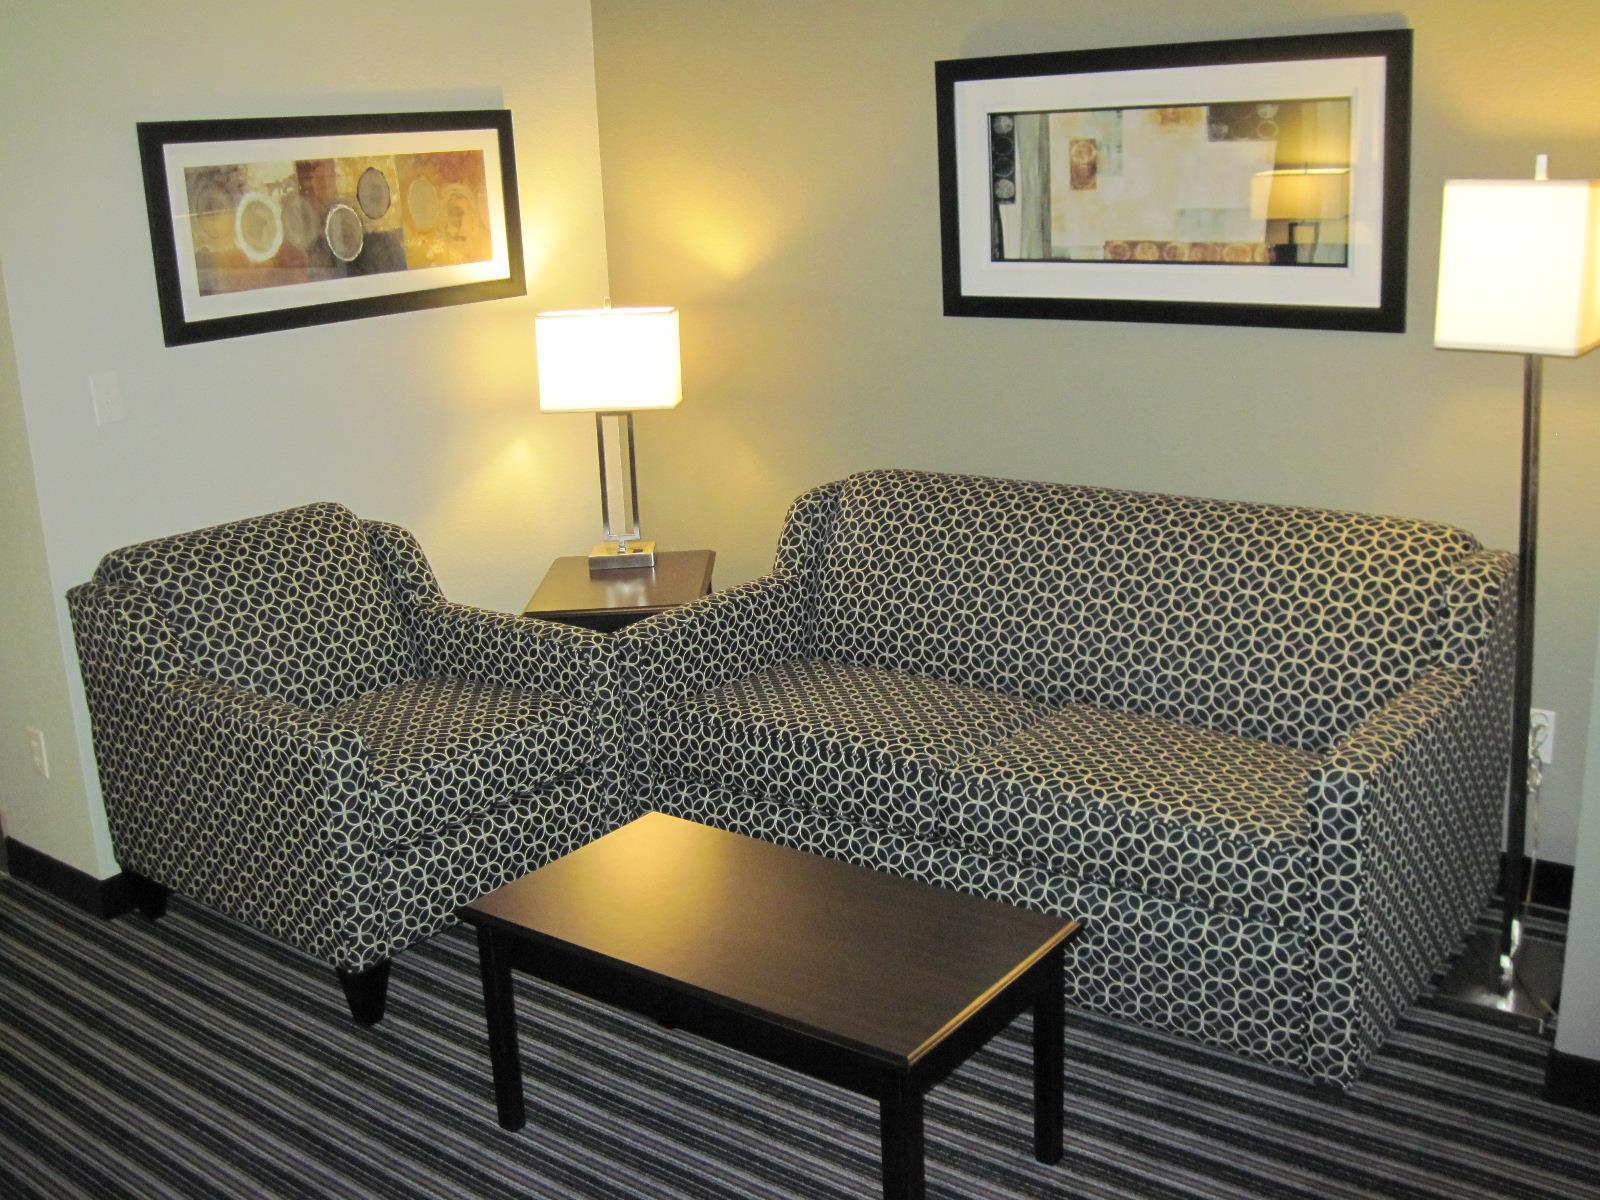 Best Western Plus Austin Airport Inn & Suites image 16